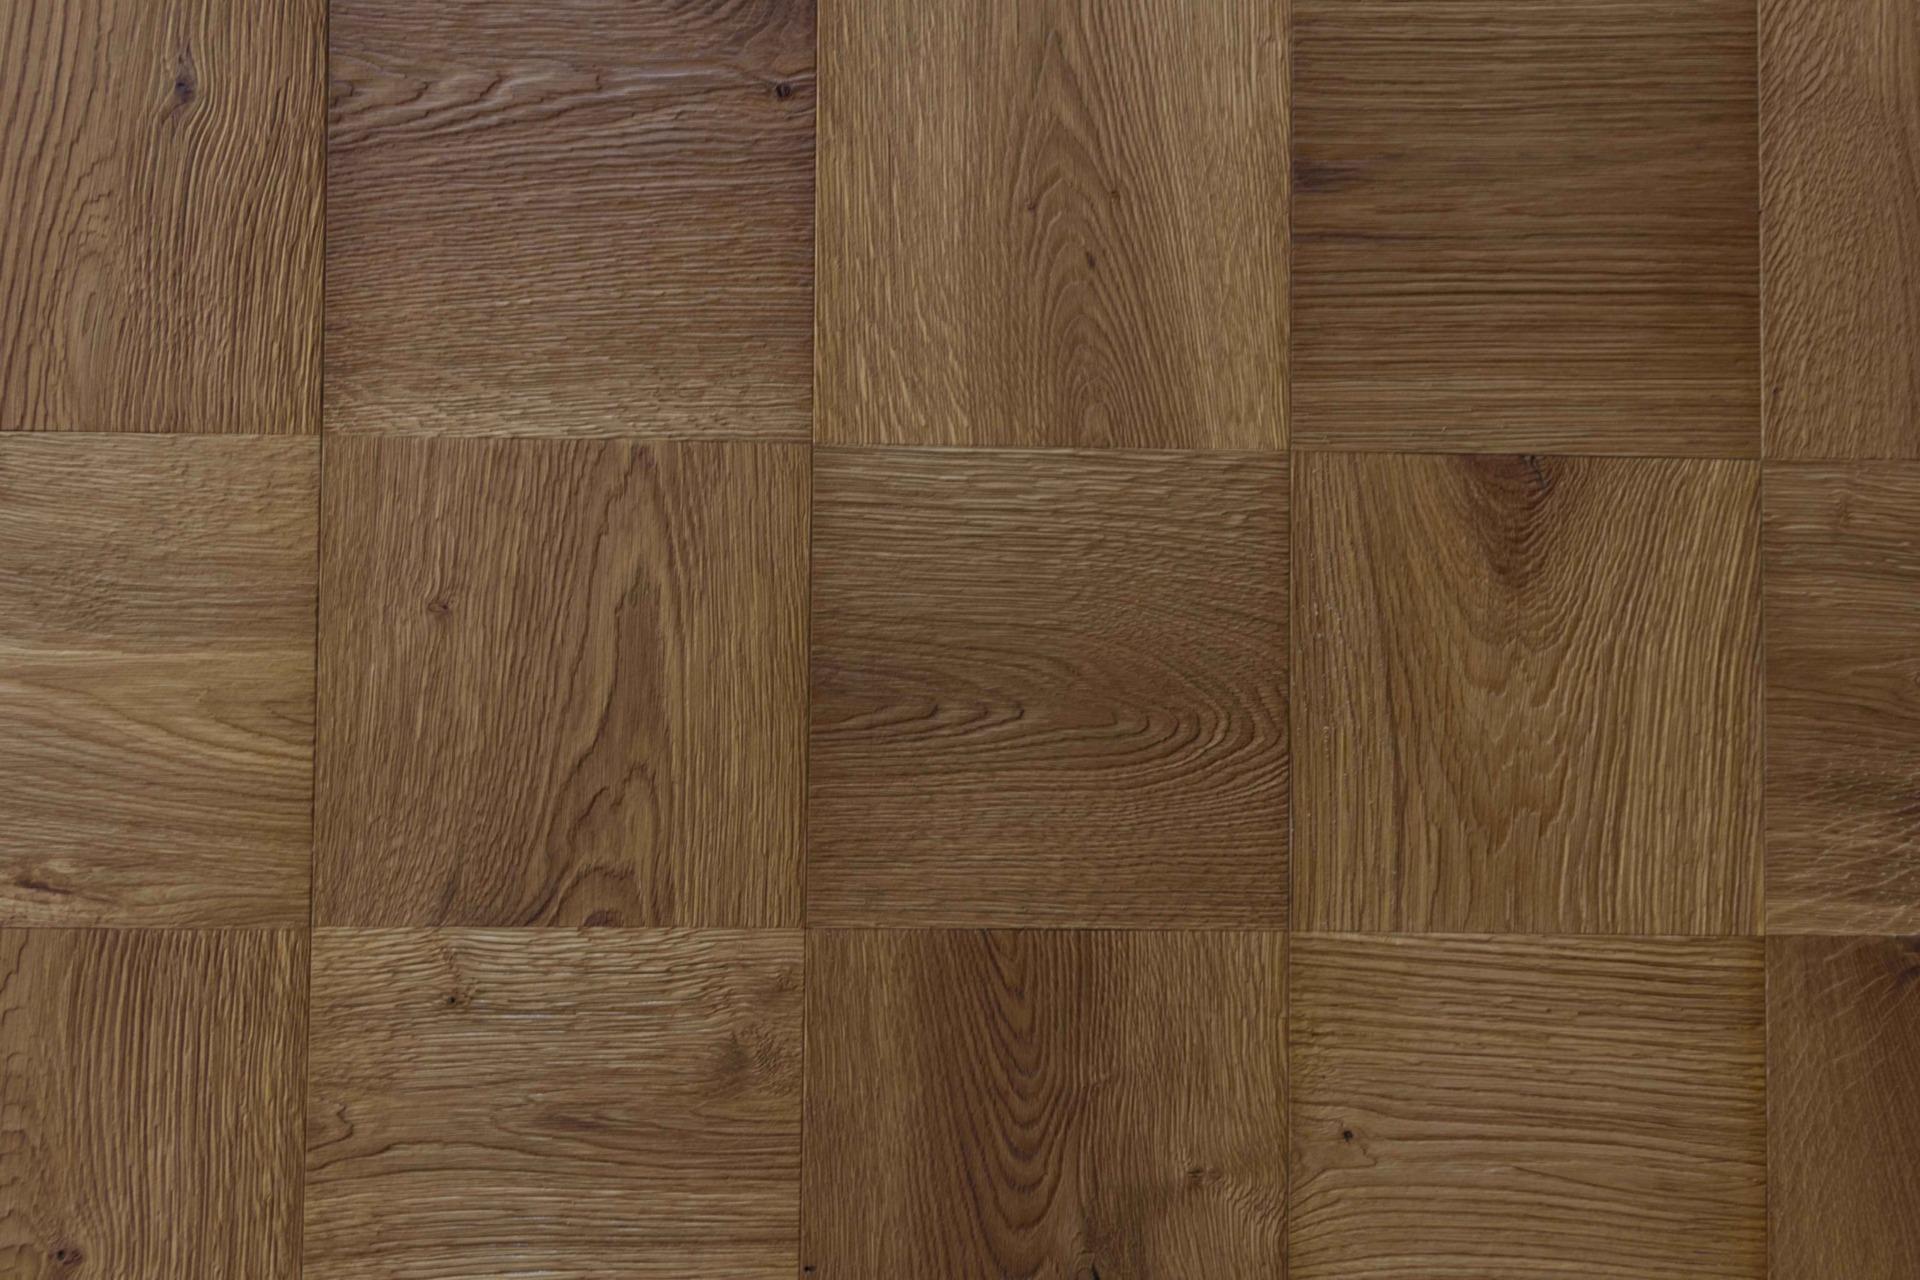 Block panel 1-strip 15/4 x 190 x 1900 mm deep brushed rustic A/B